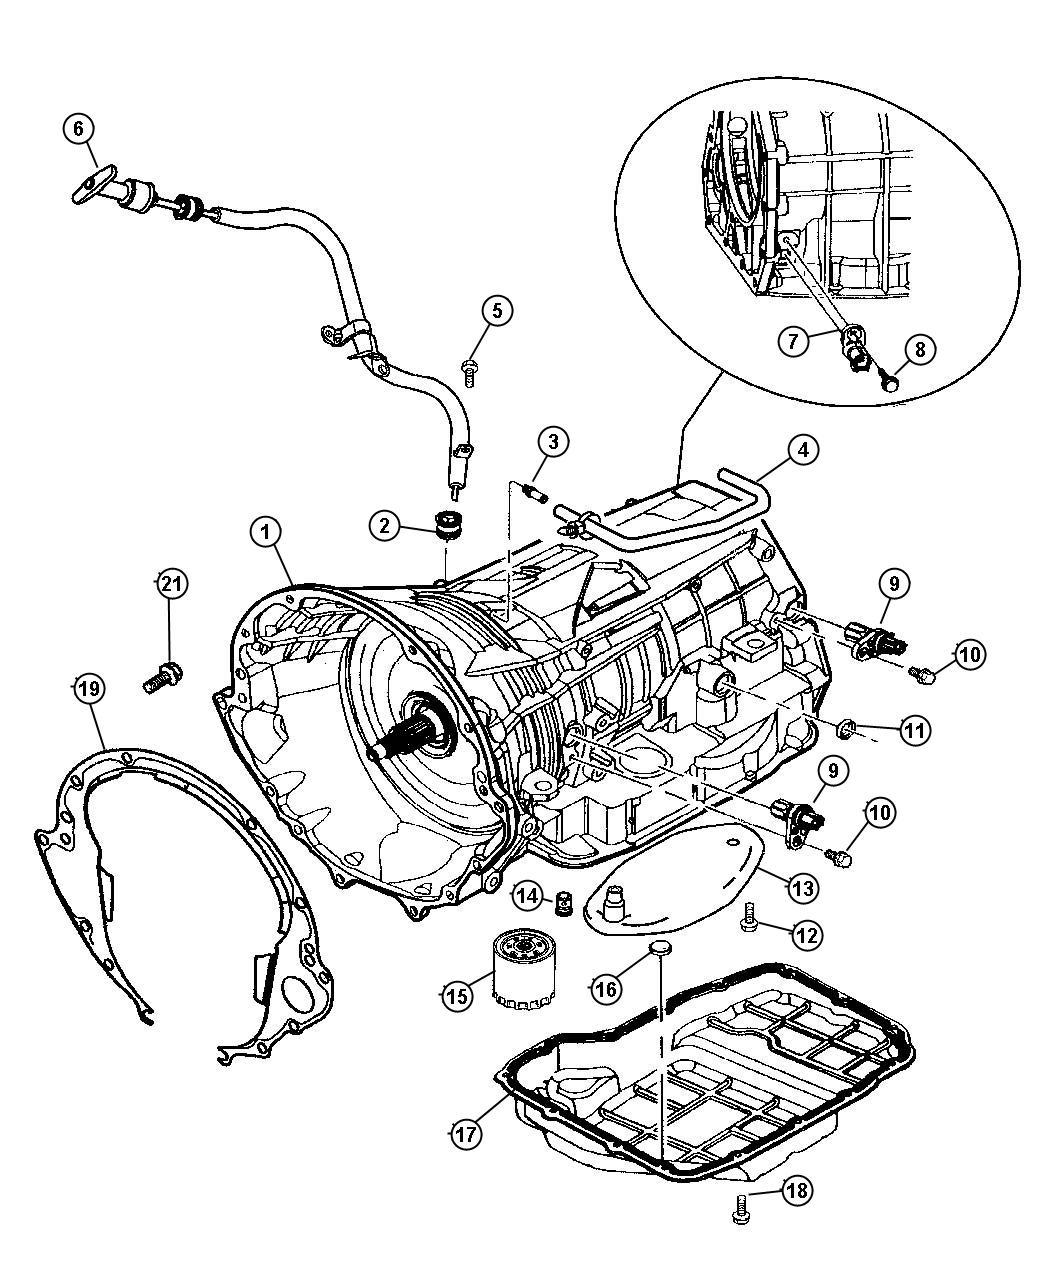 dodge ram 1500 parts diagram 1996 club car wiring 48 volt 2002 transmission free